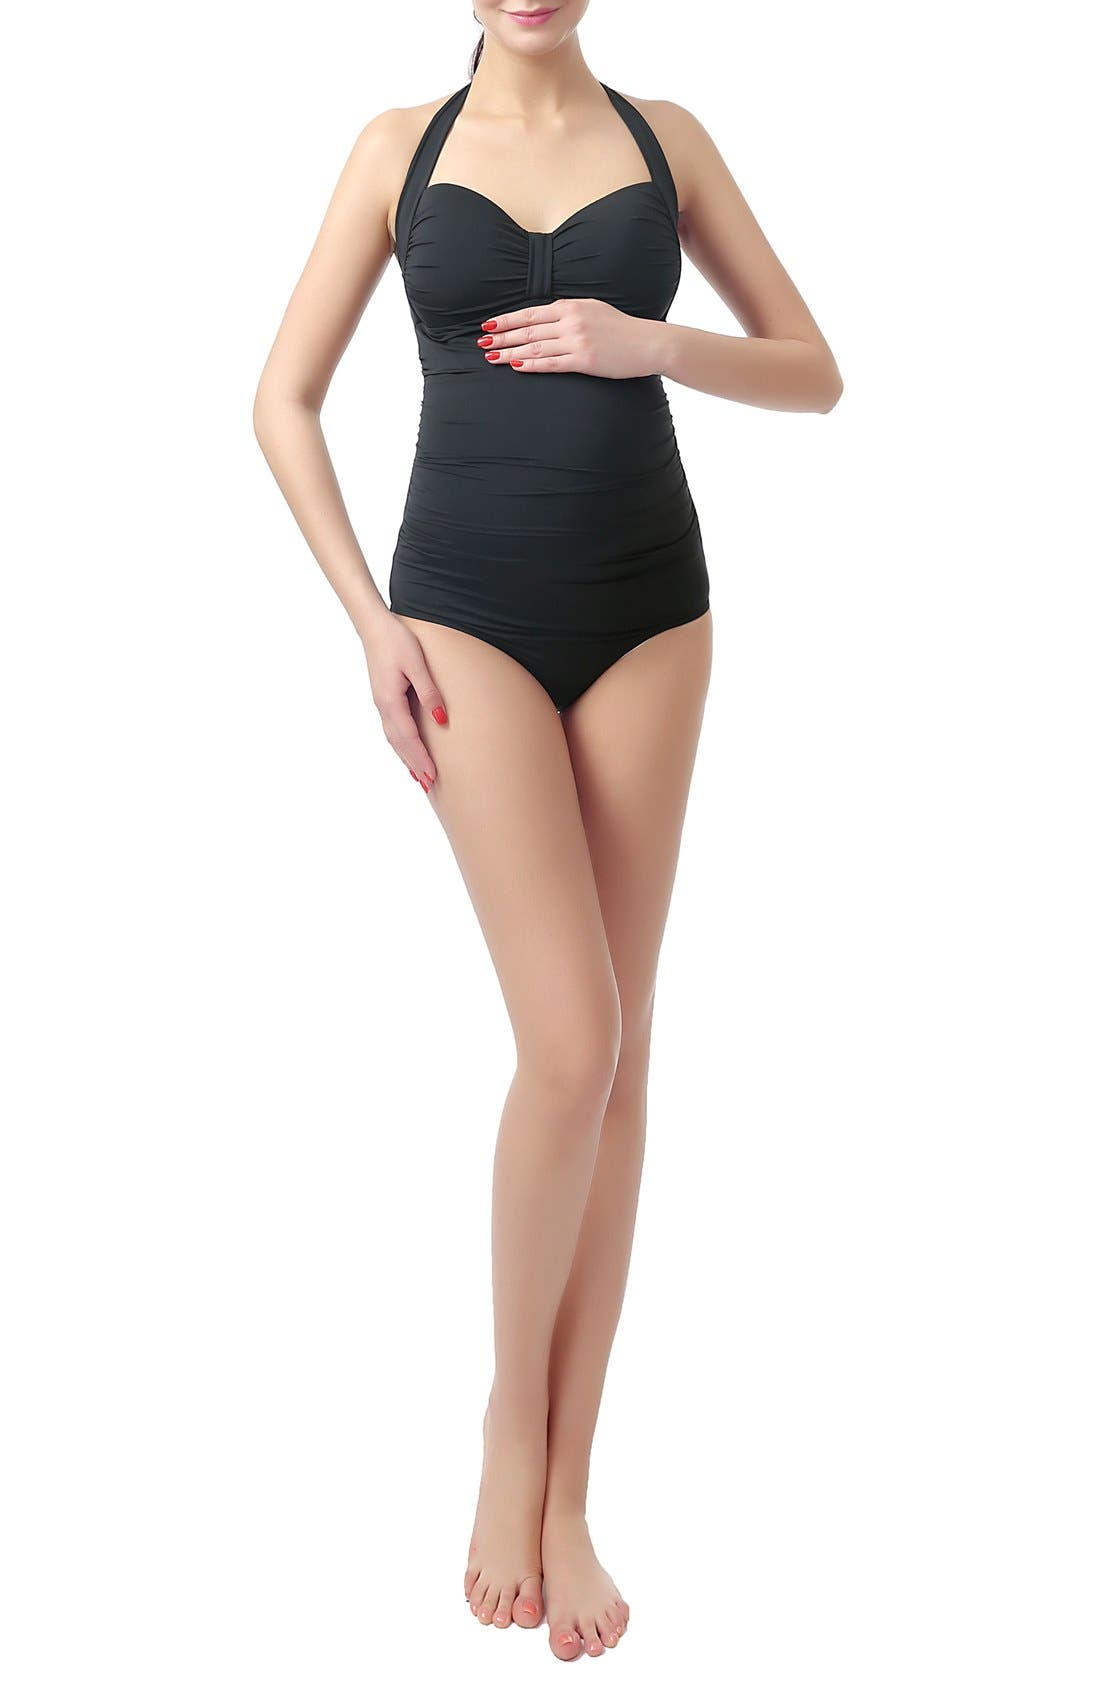 'Dana' Maternity One-Piece Halter Swimsuit,                         Main,                         color, Black